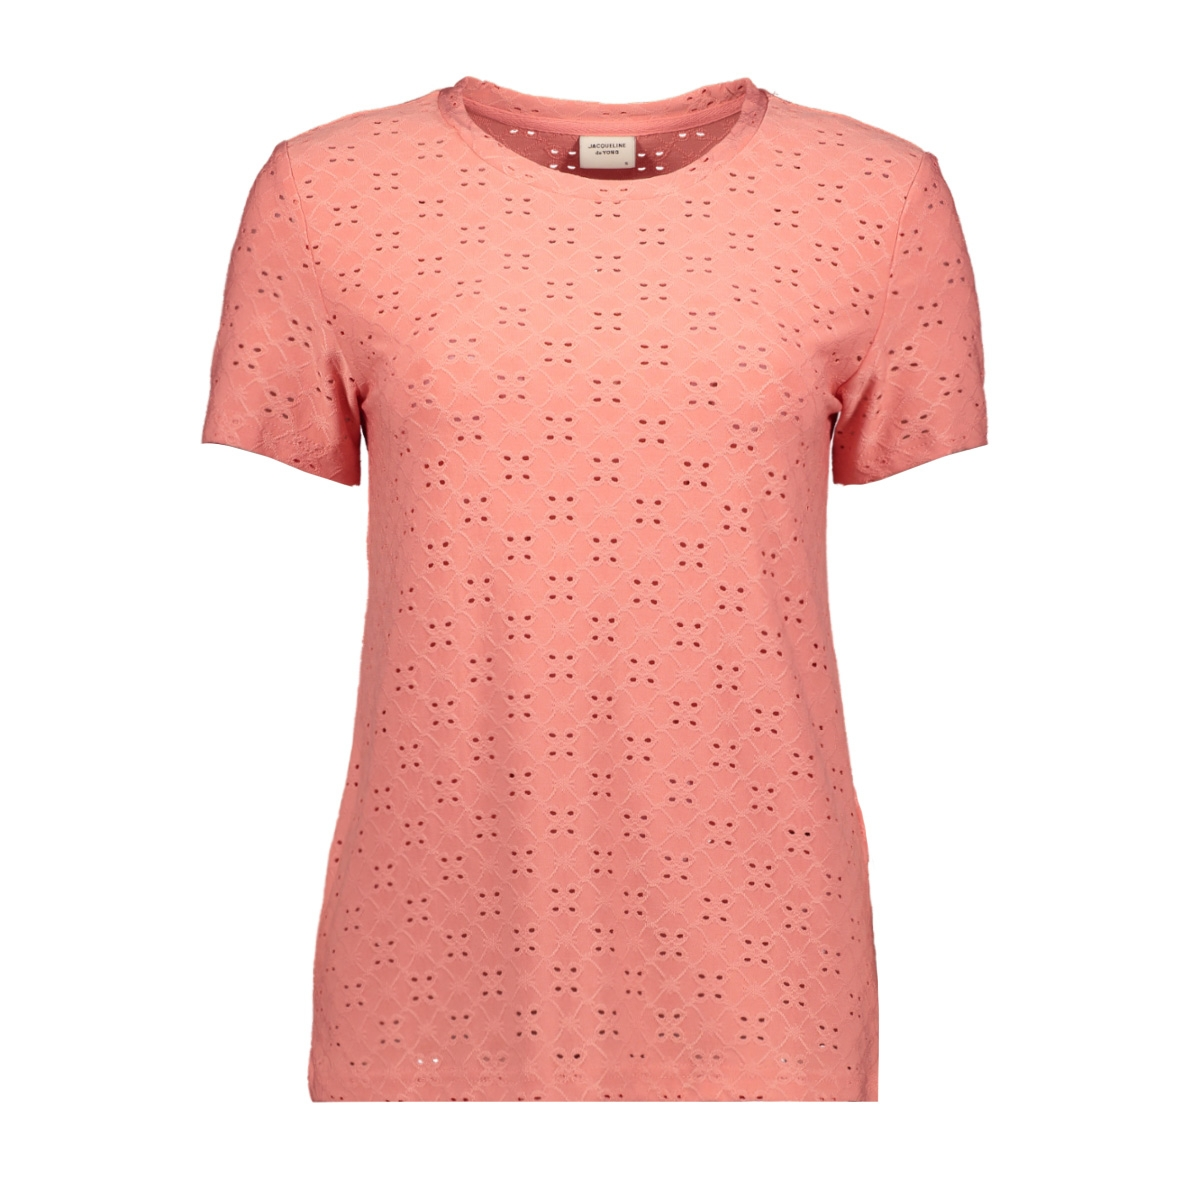 jdycathinka s/s tag top jrs noos 15158450 jacqueline de yong t-shirt peach blossom